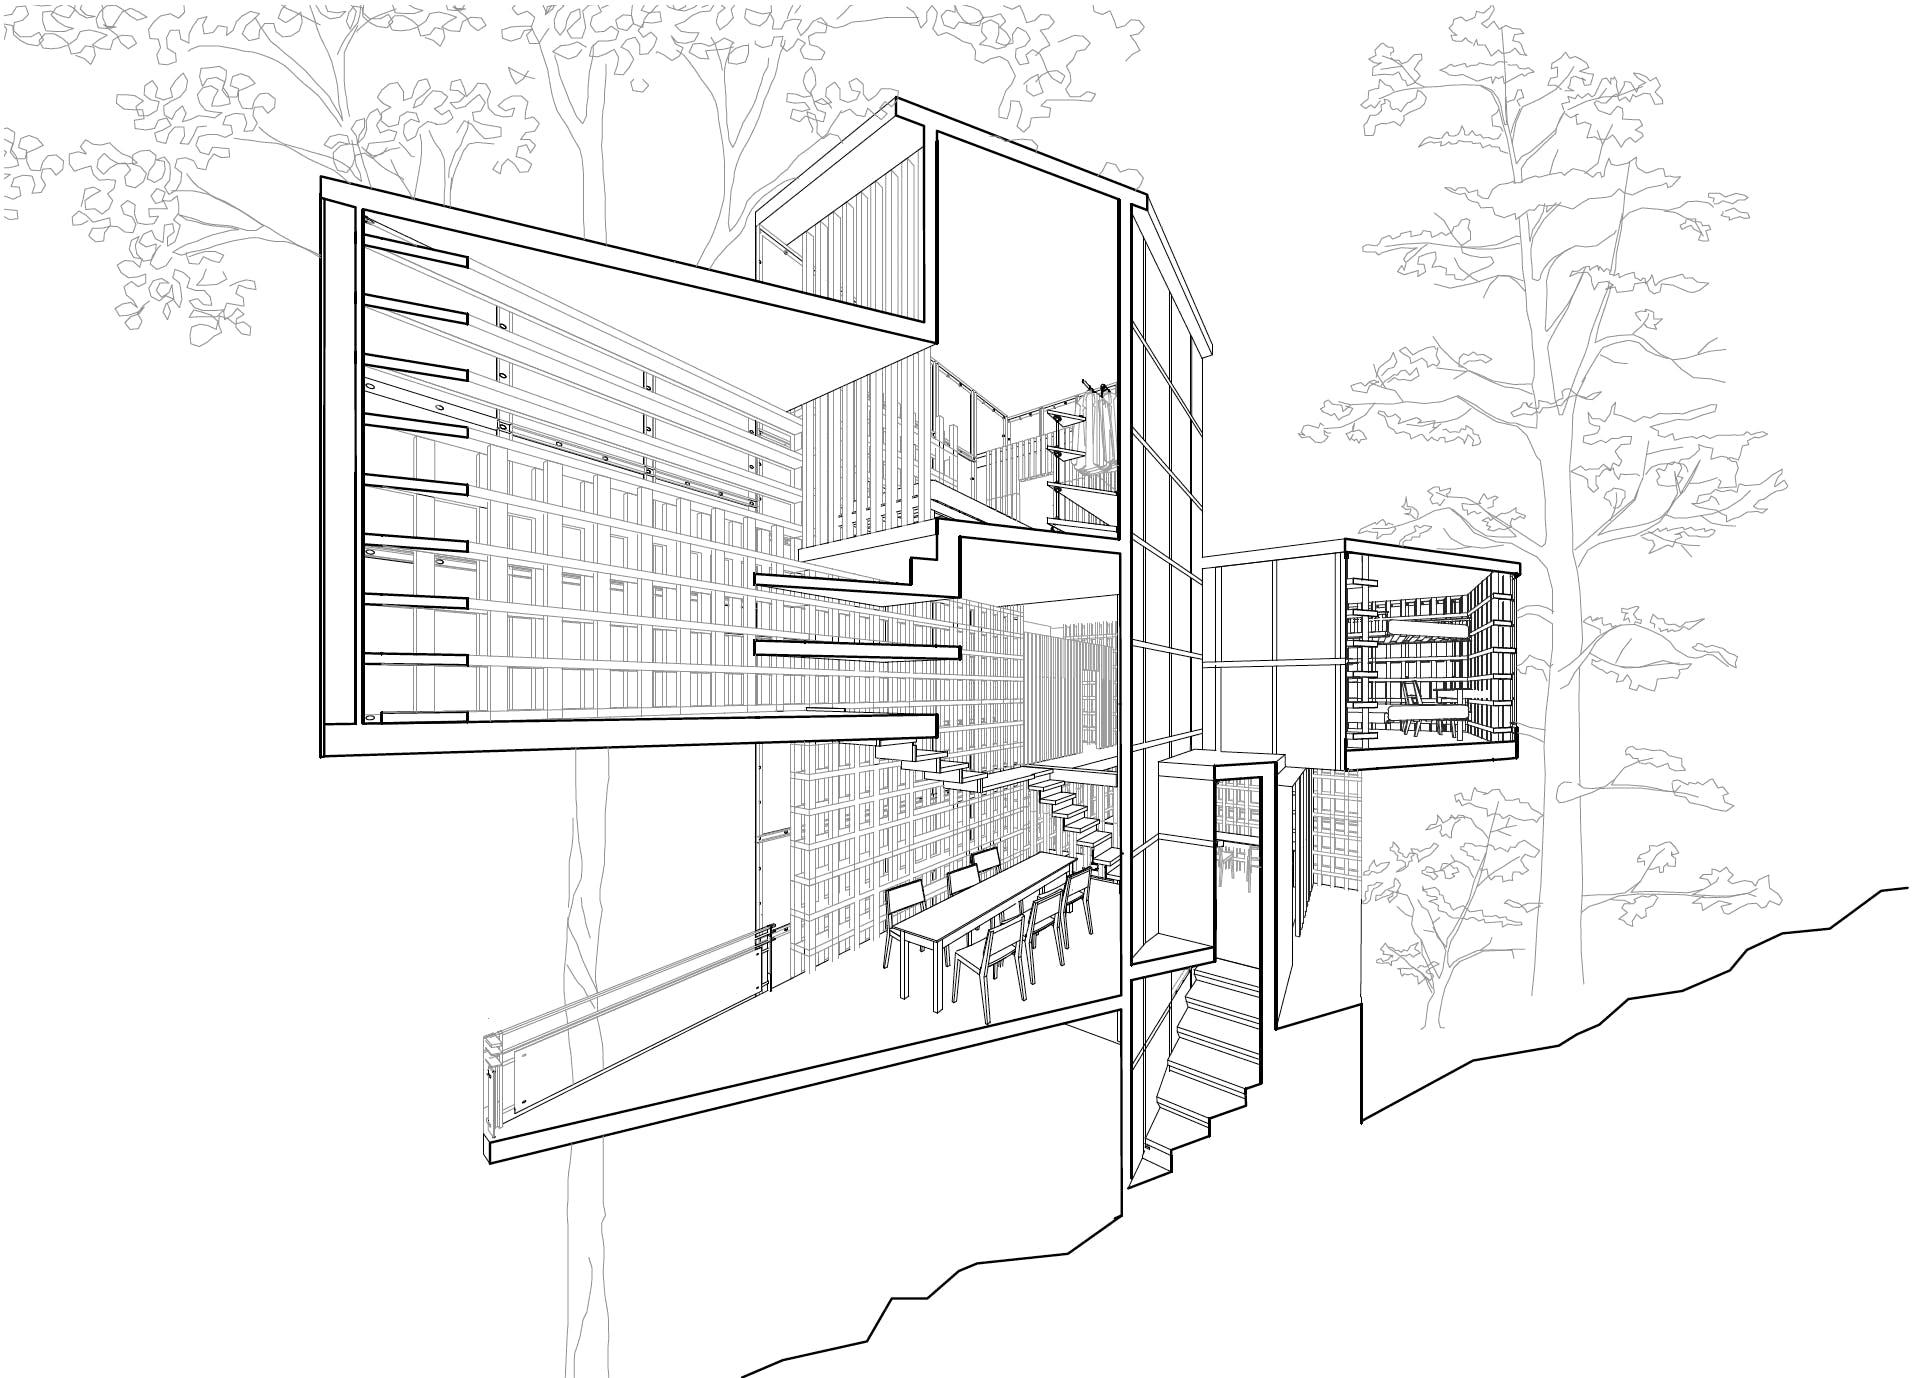 Quick, week-long housing proposals were explored for minimal footprint design.